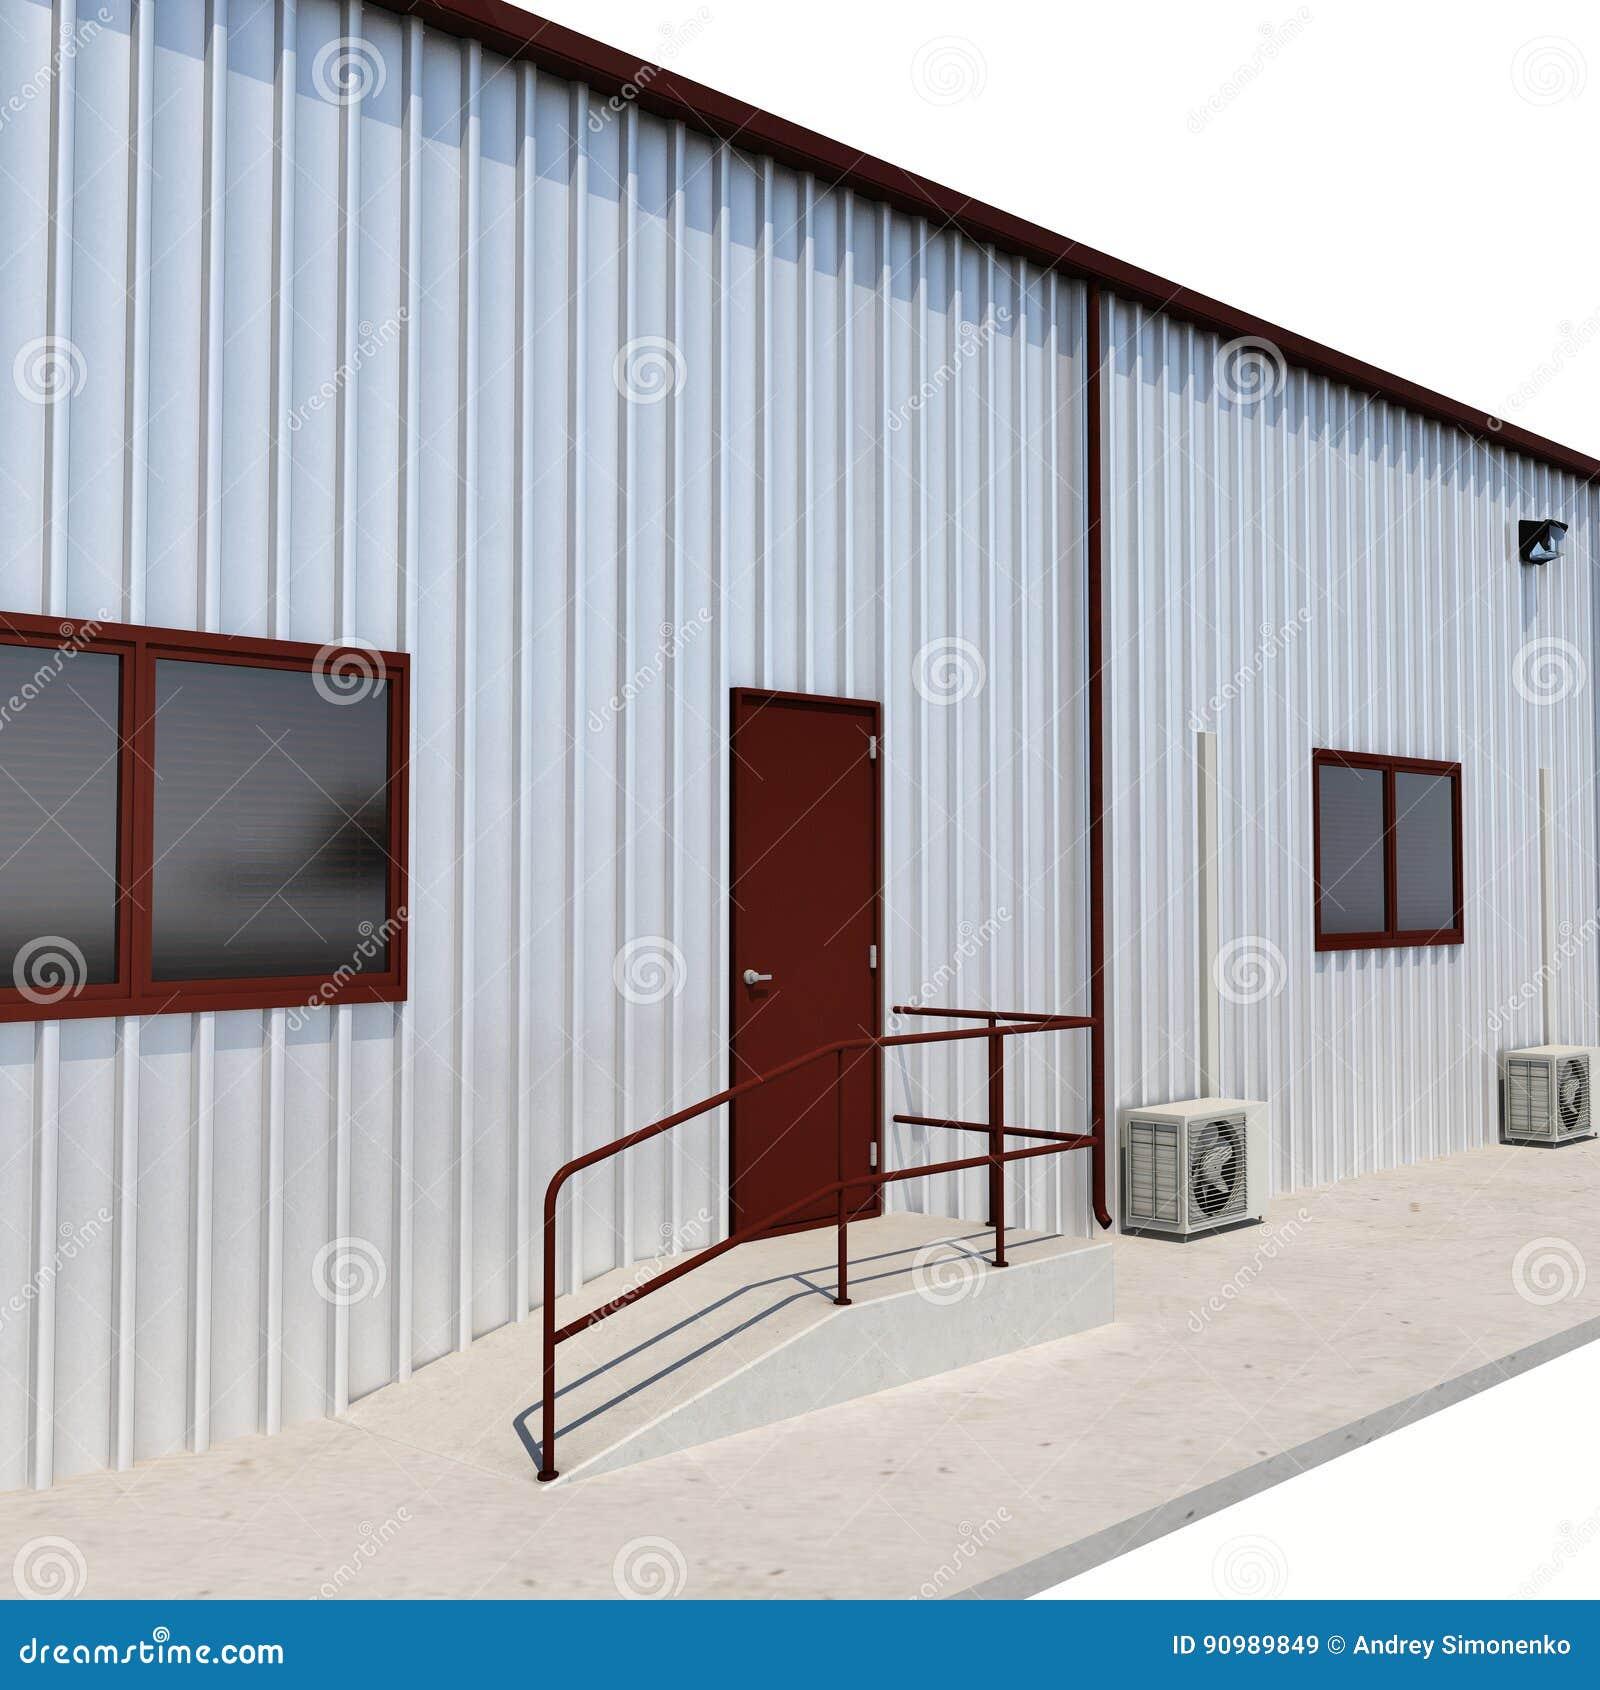 Warehouse building door on white 3d illustration stock for Door 3d warehouse